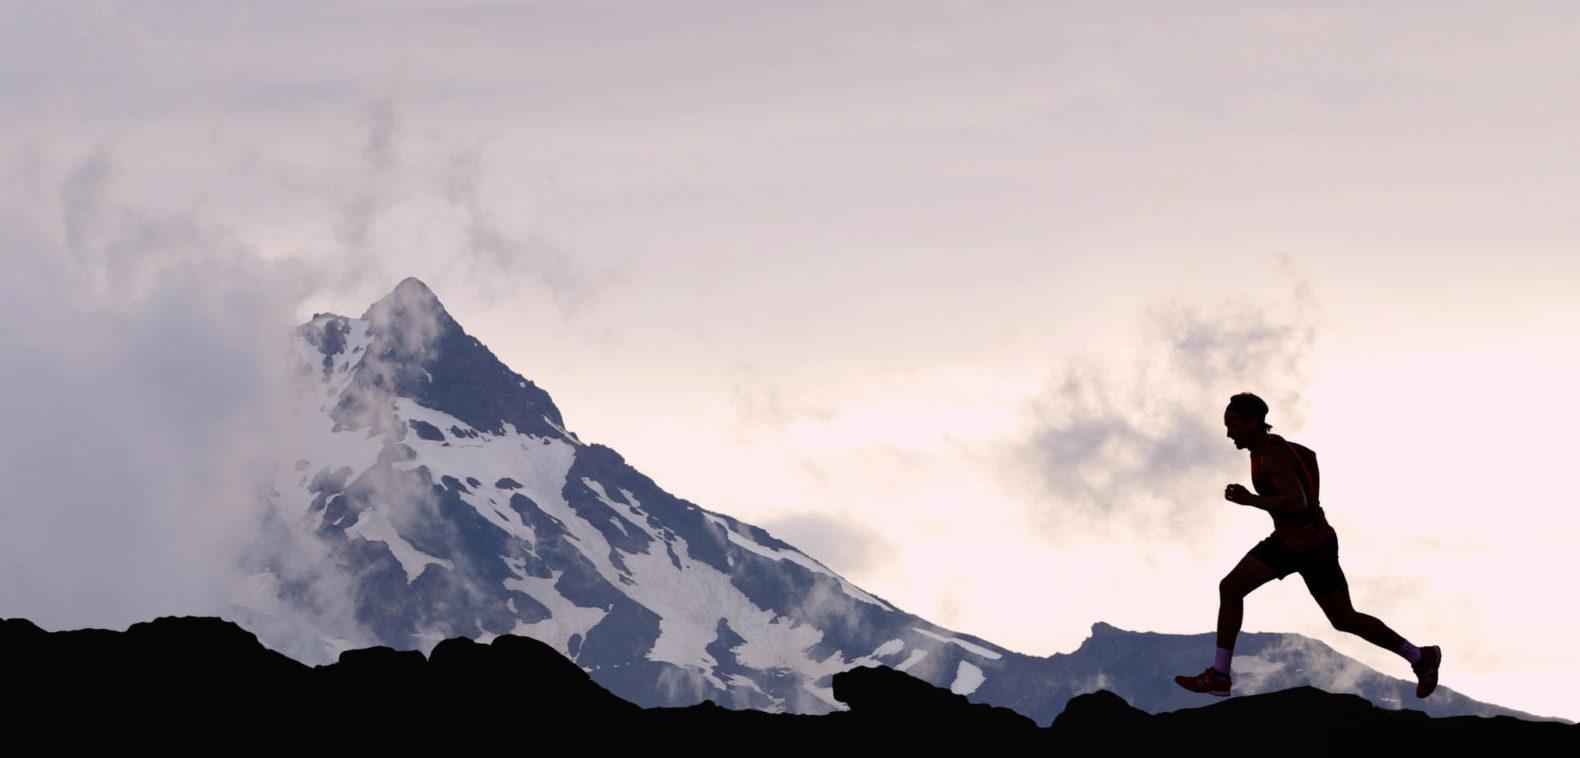 trail runner mountains snow winter